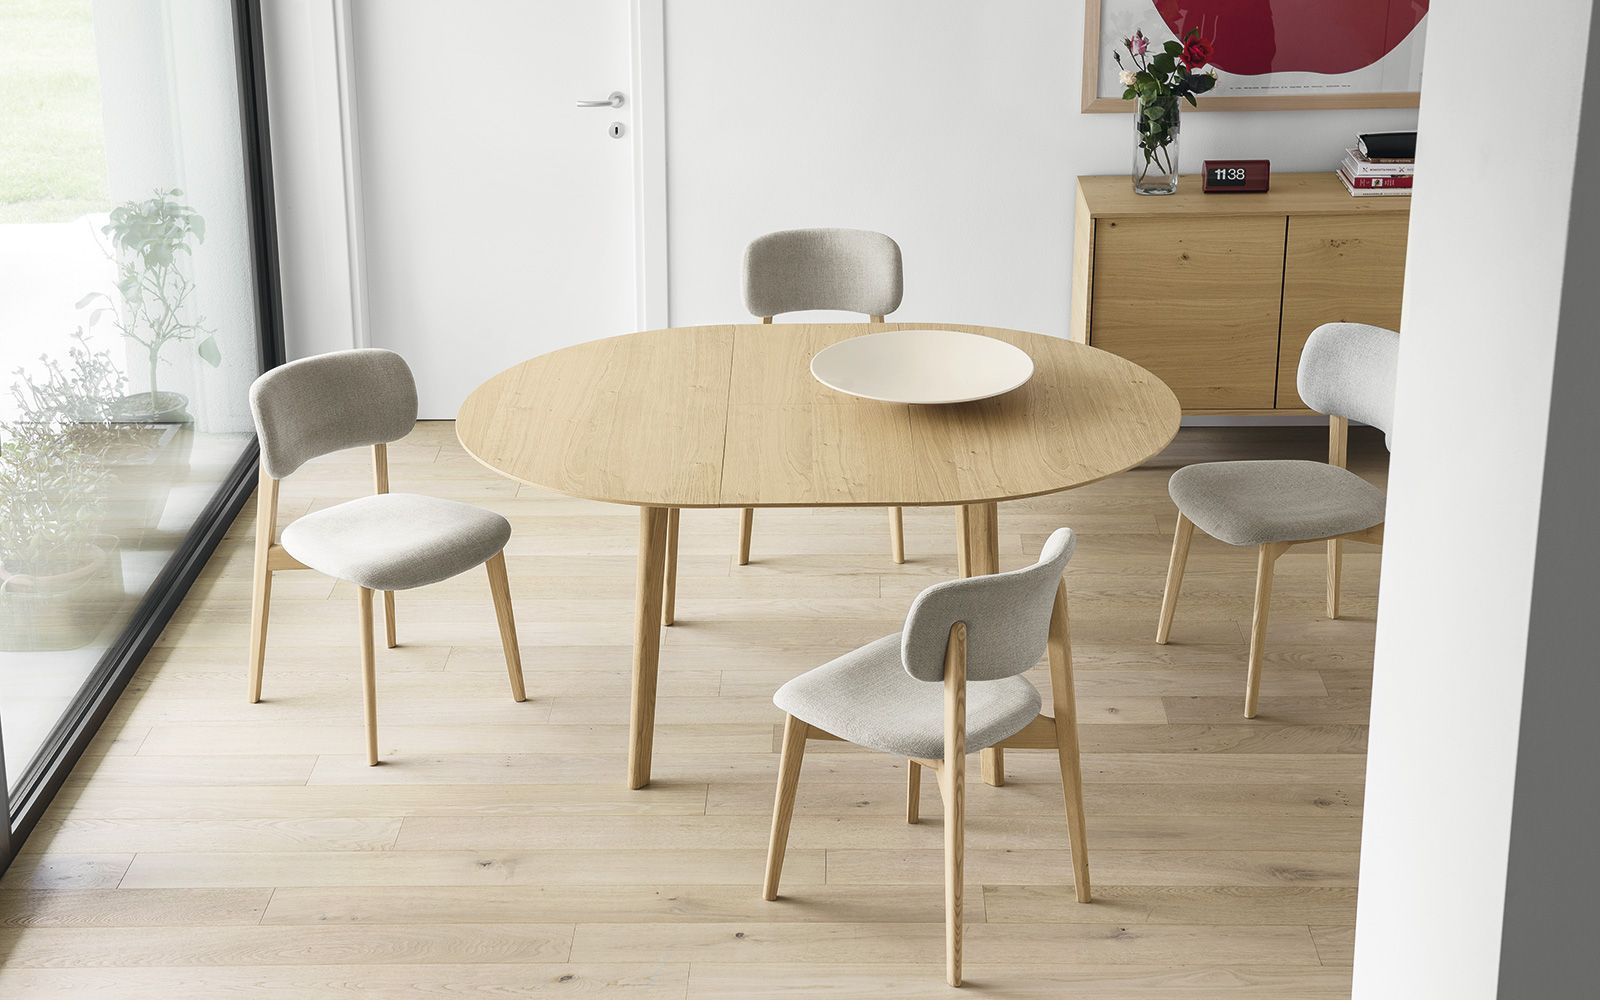 Tavolo Industriale Allungabile : Tavolo rotondo allungabile cream table calligaris cs 4063 rd